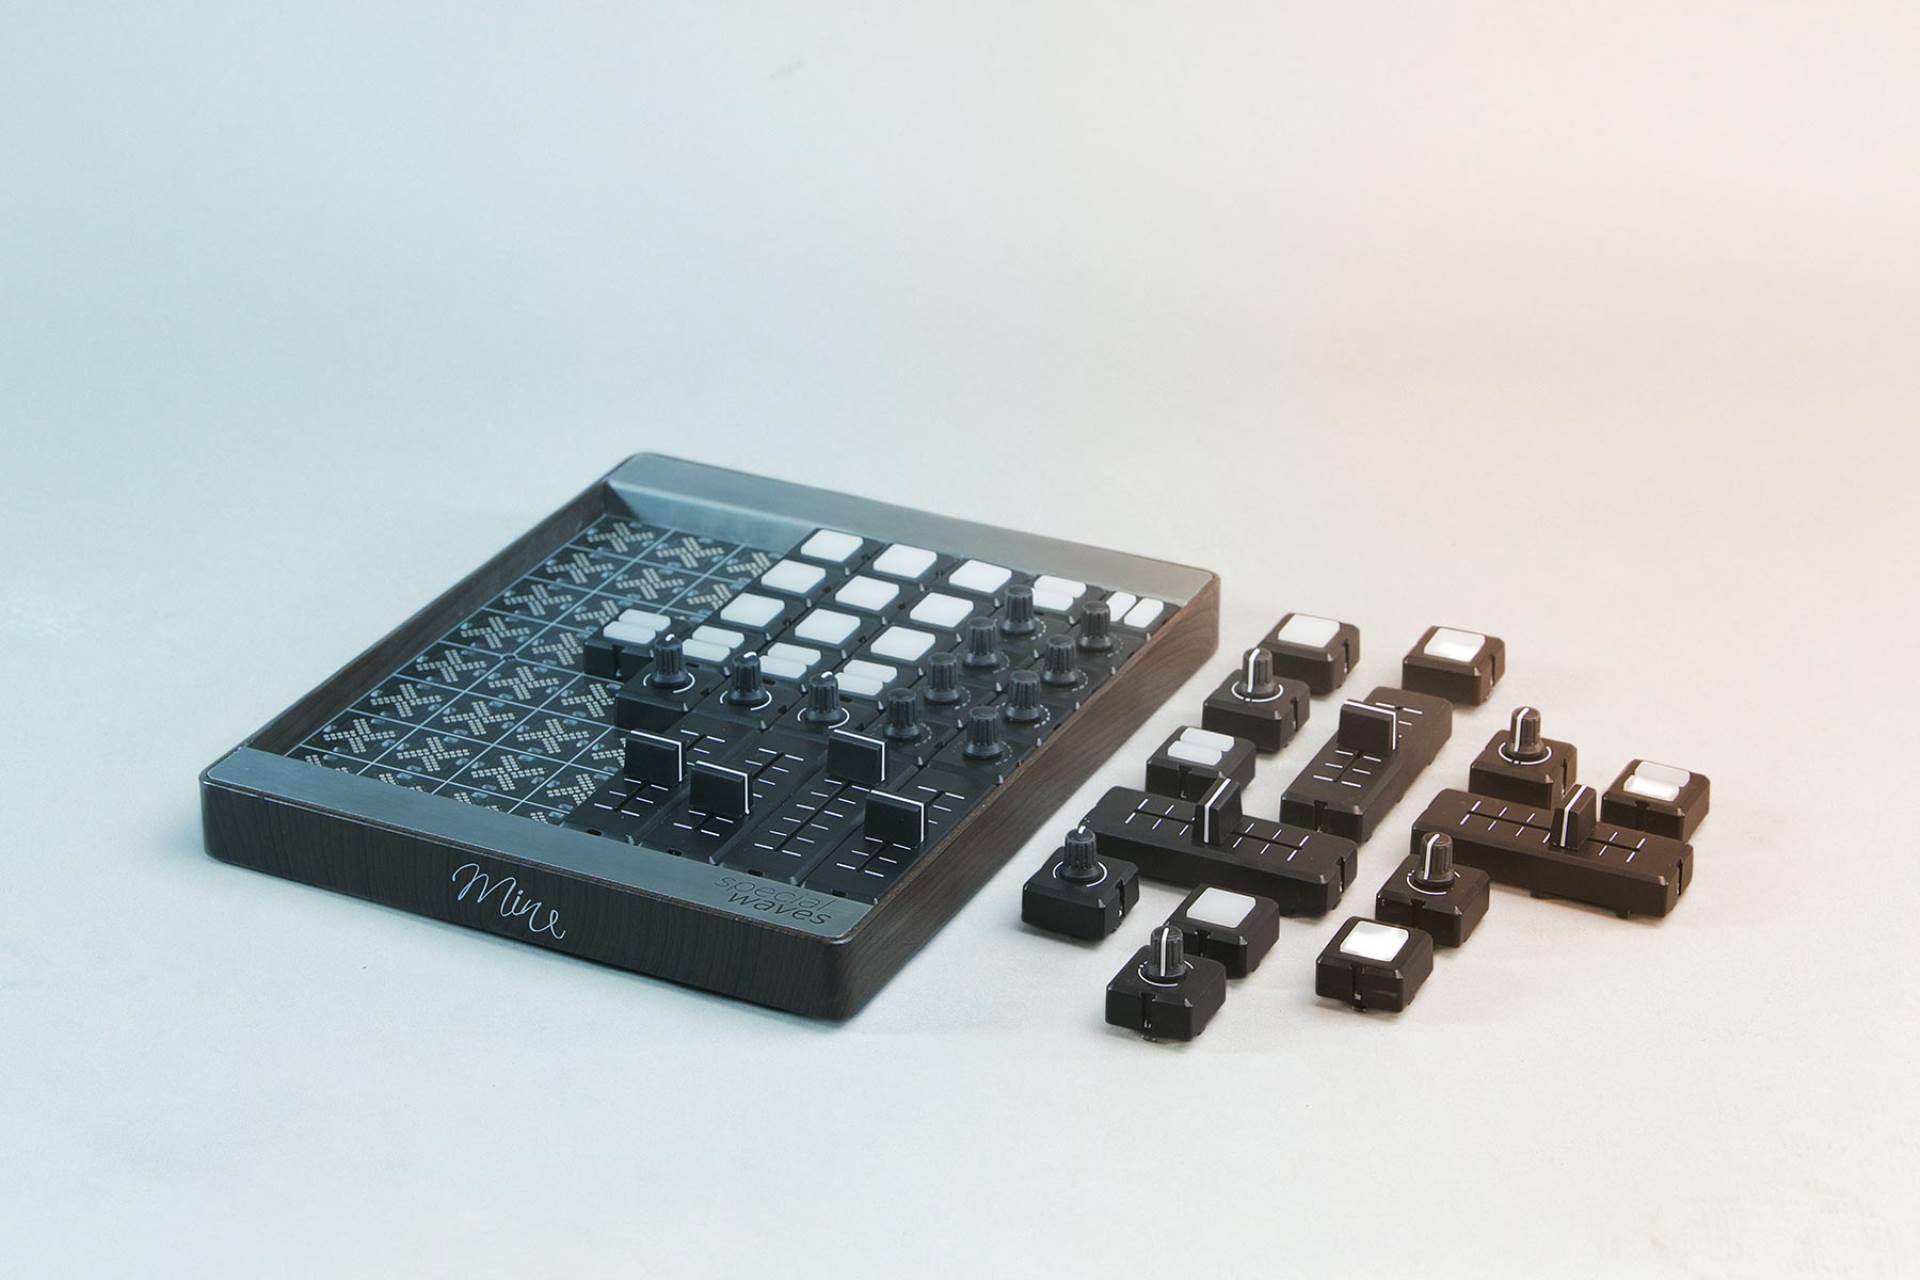 Special Waves Mine modularer Controller